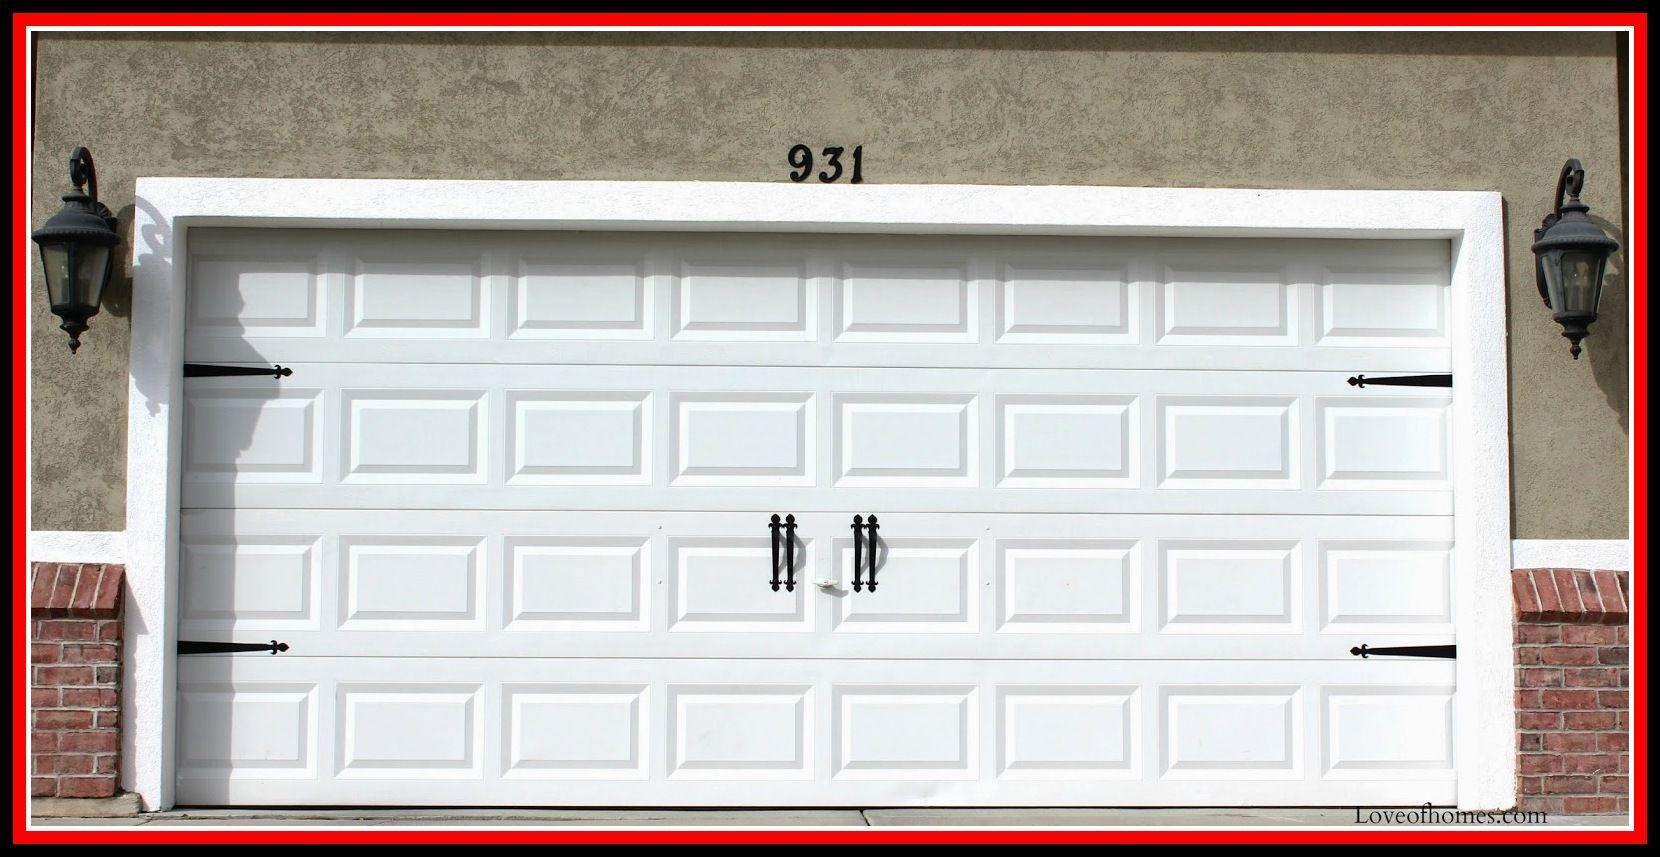 31 Reference Of Double Door Garage Decorative In 2020 Garage Doors Garage Door Decorative Hardware Doors